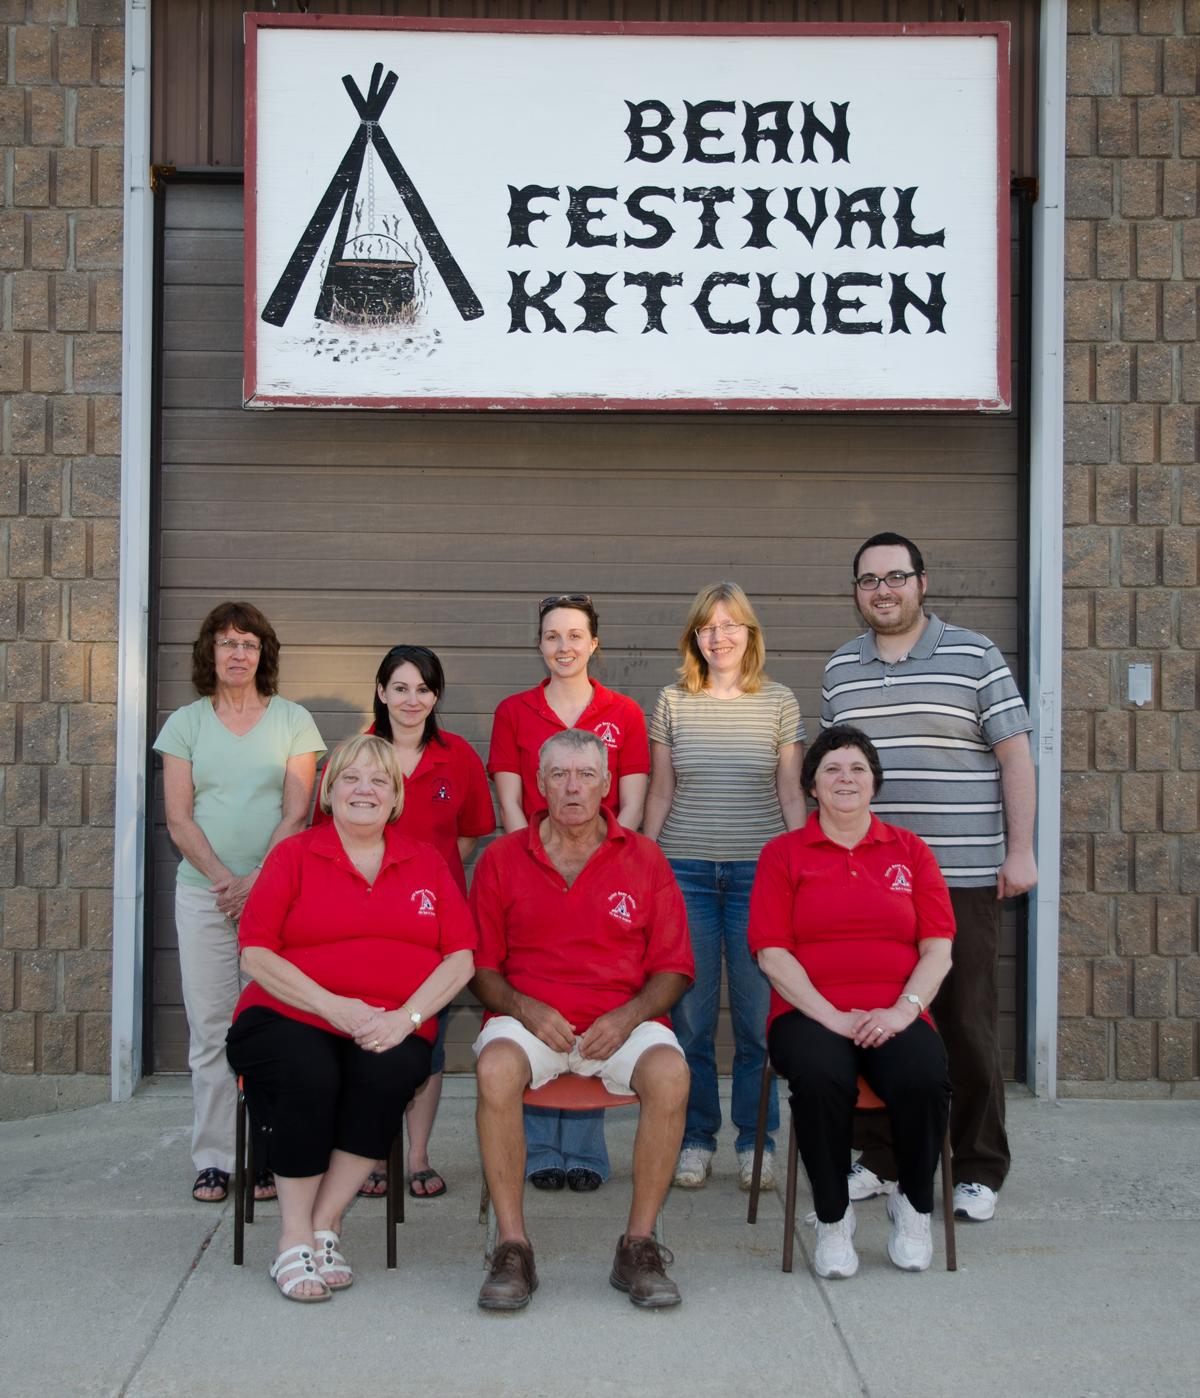 2013/2014 Bean Fest Committee